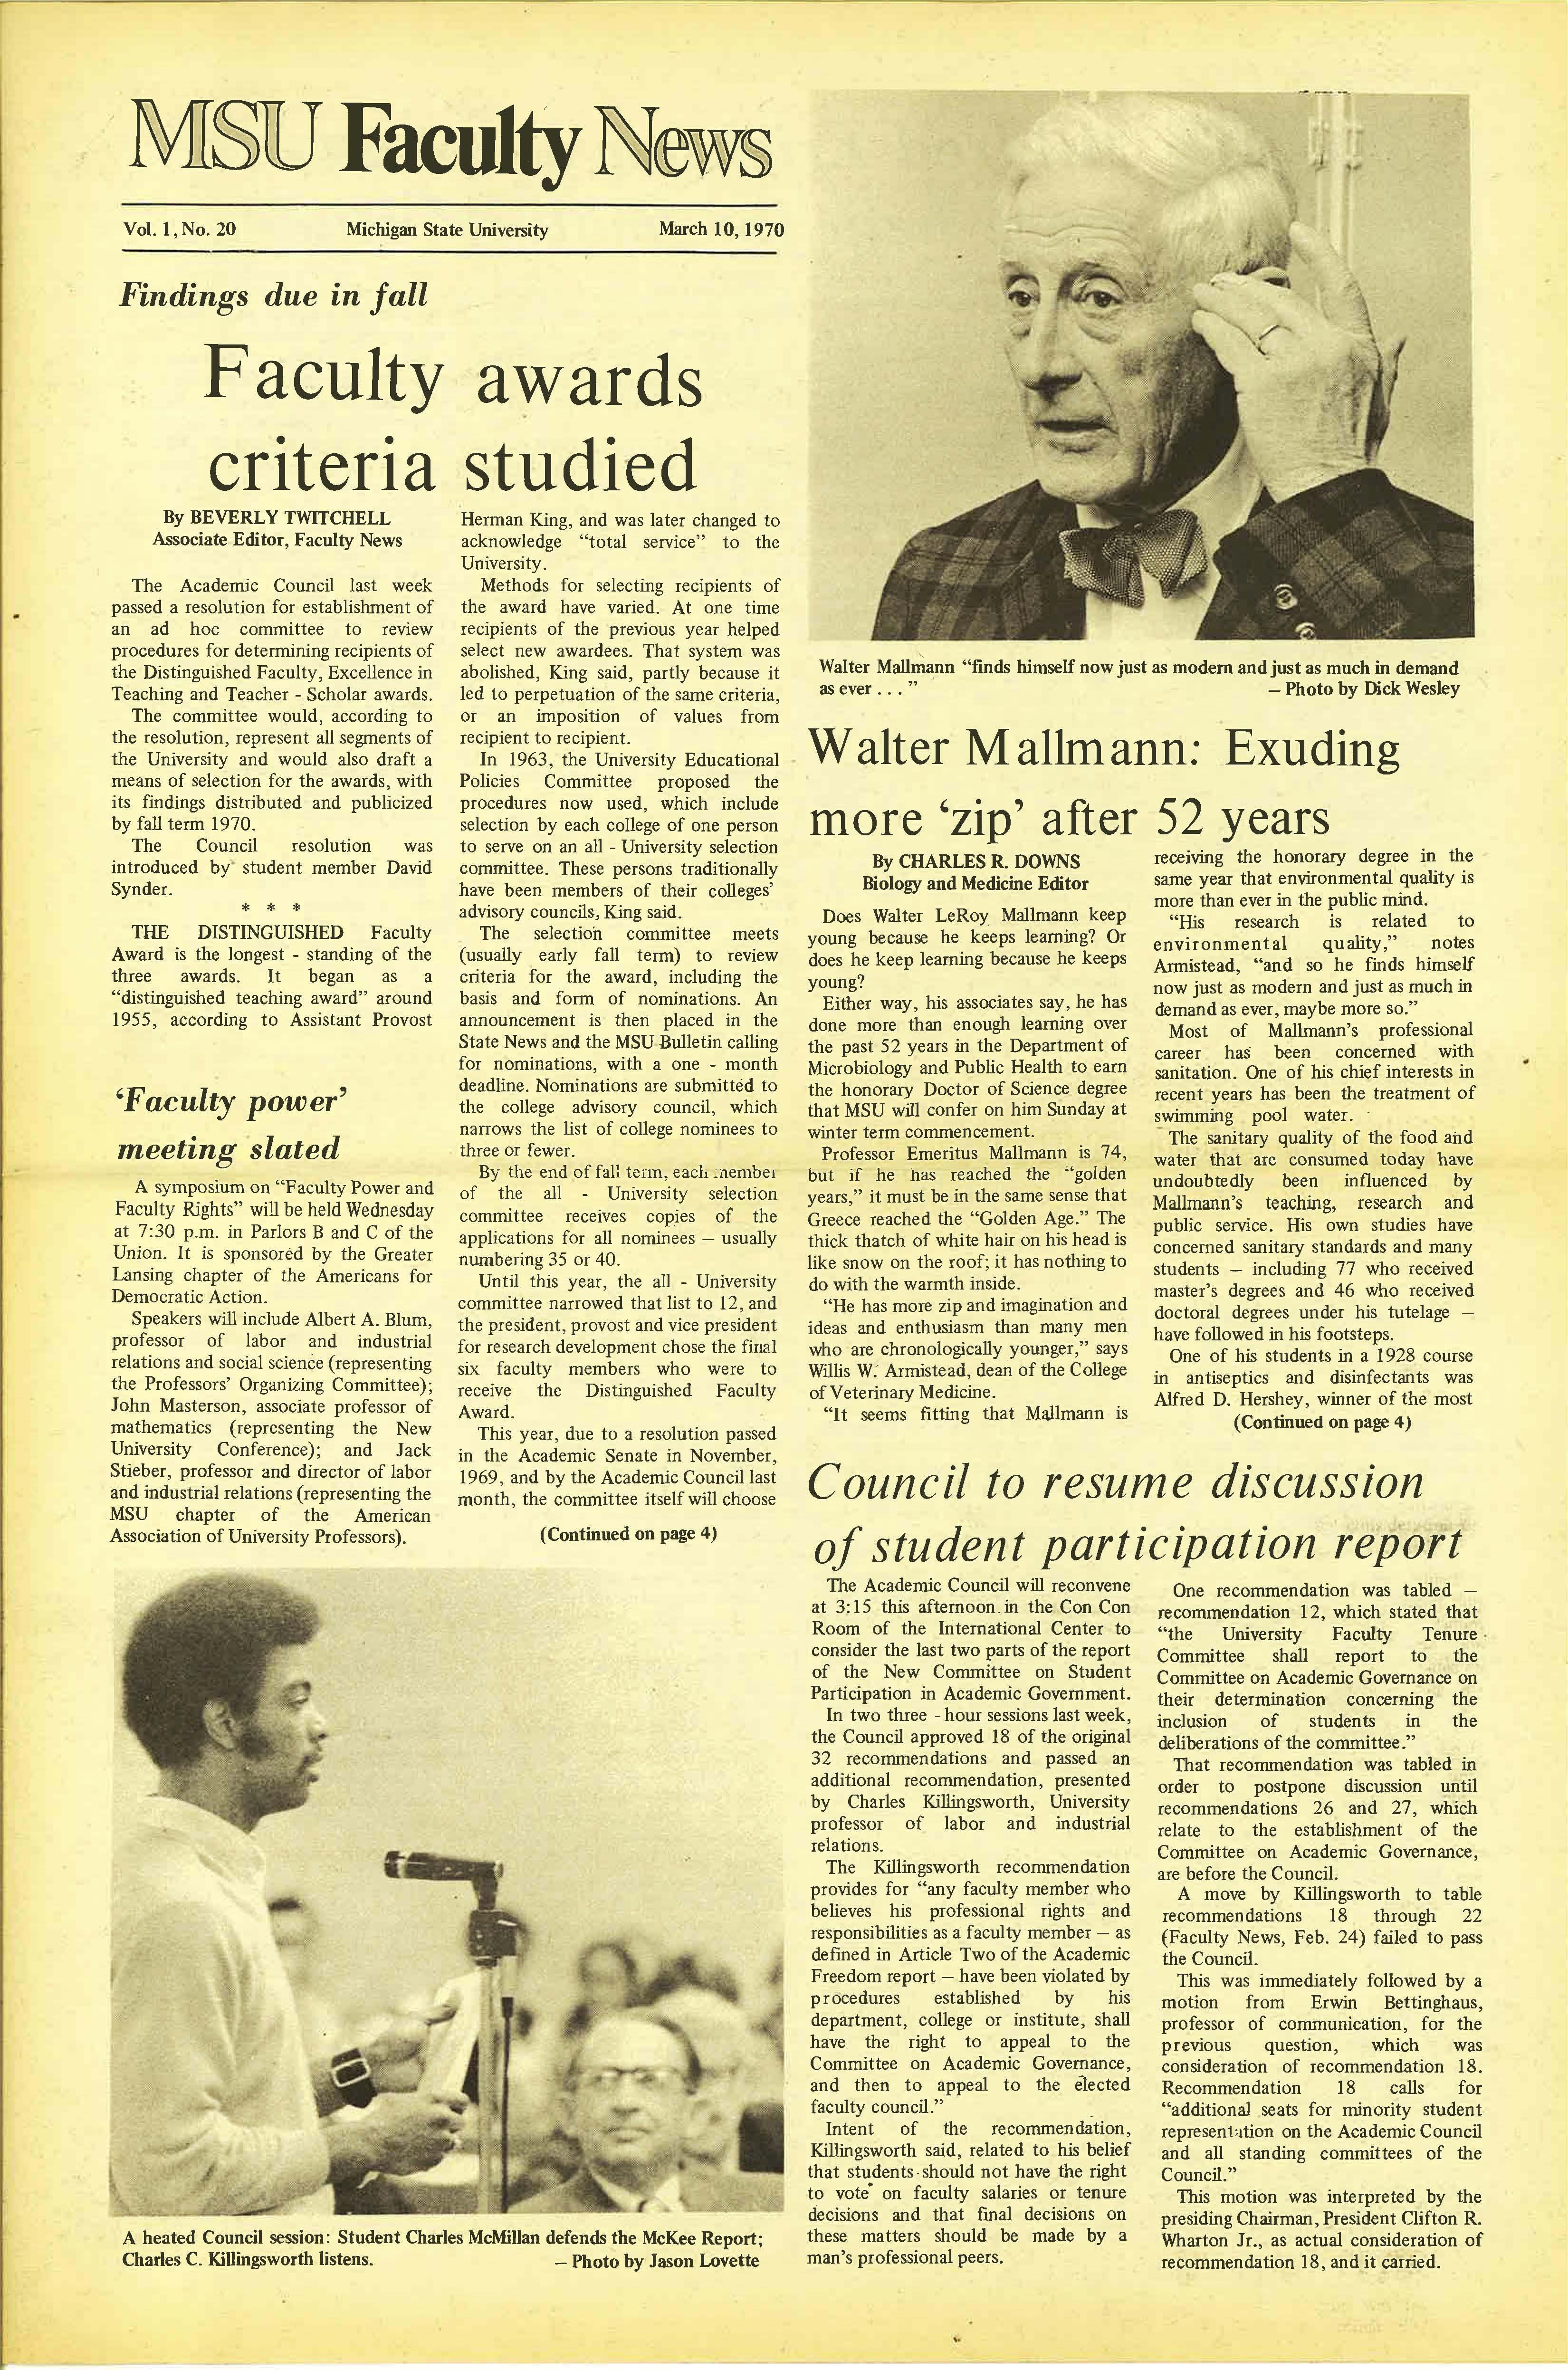 MSU News Bulletin, Vol. 2, No. 1, September 29, 1970